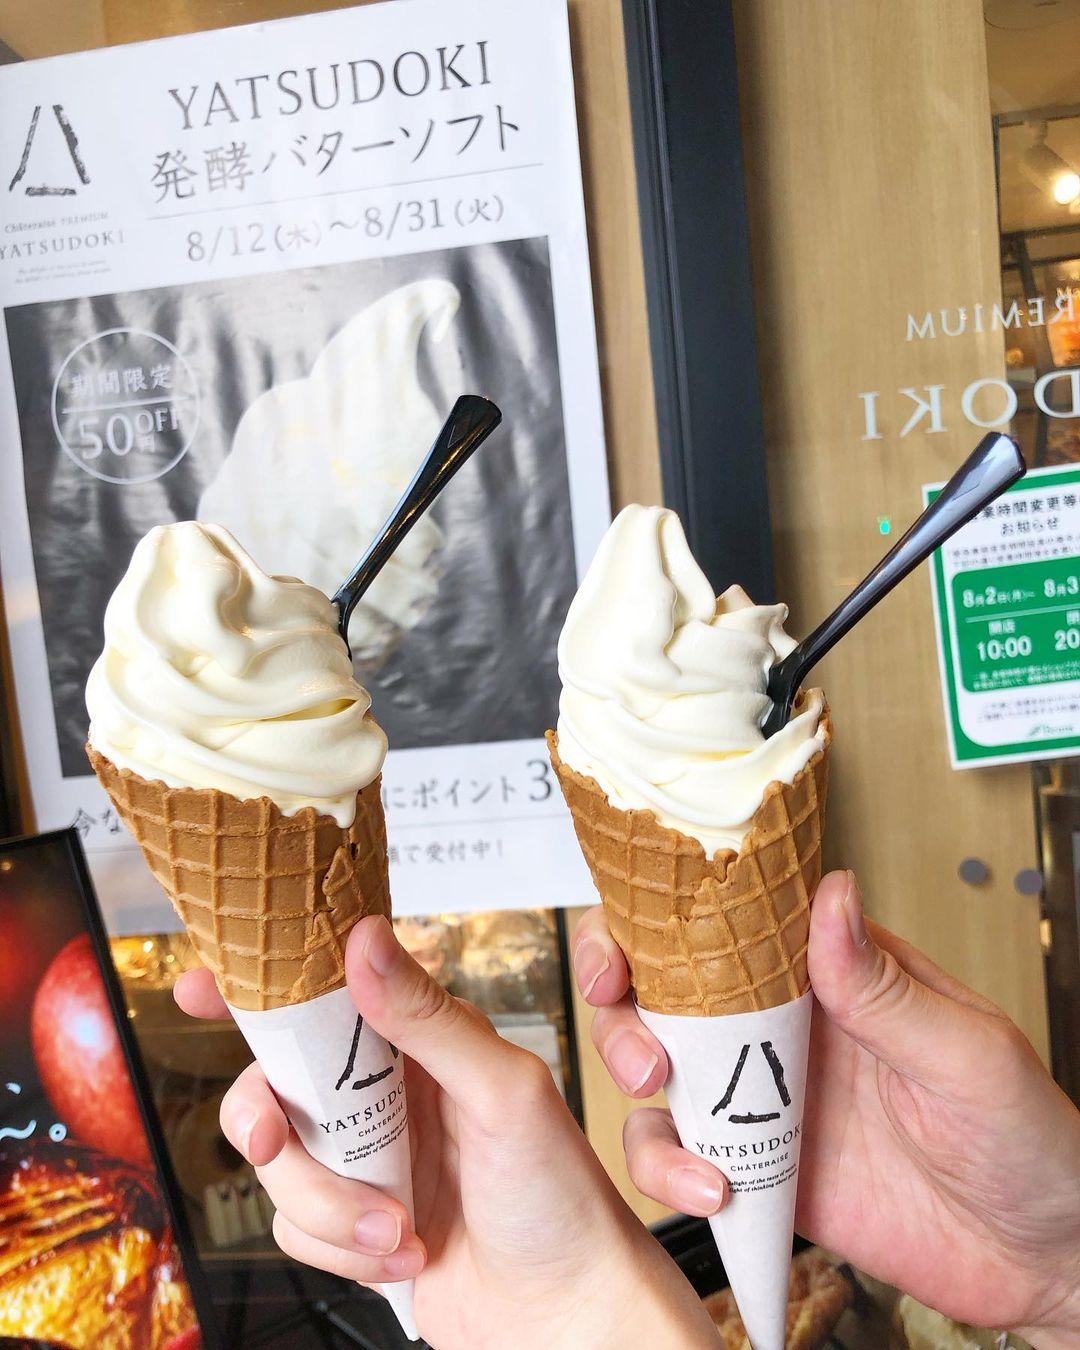 yatsudoki - fermented butter serve